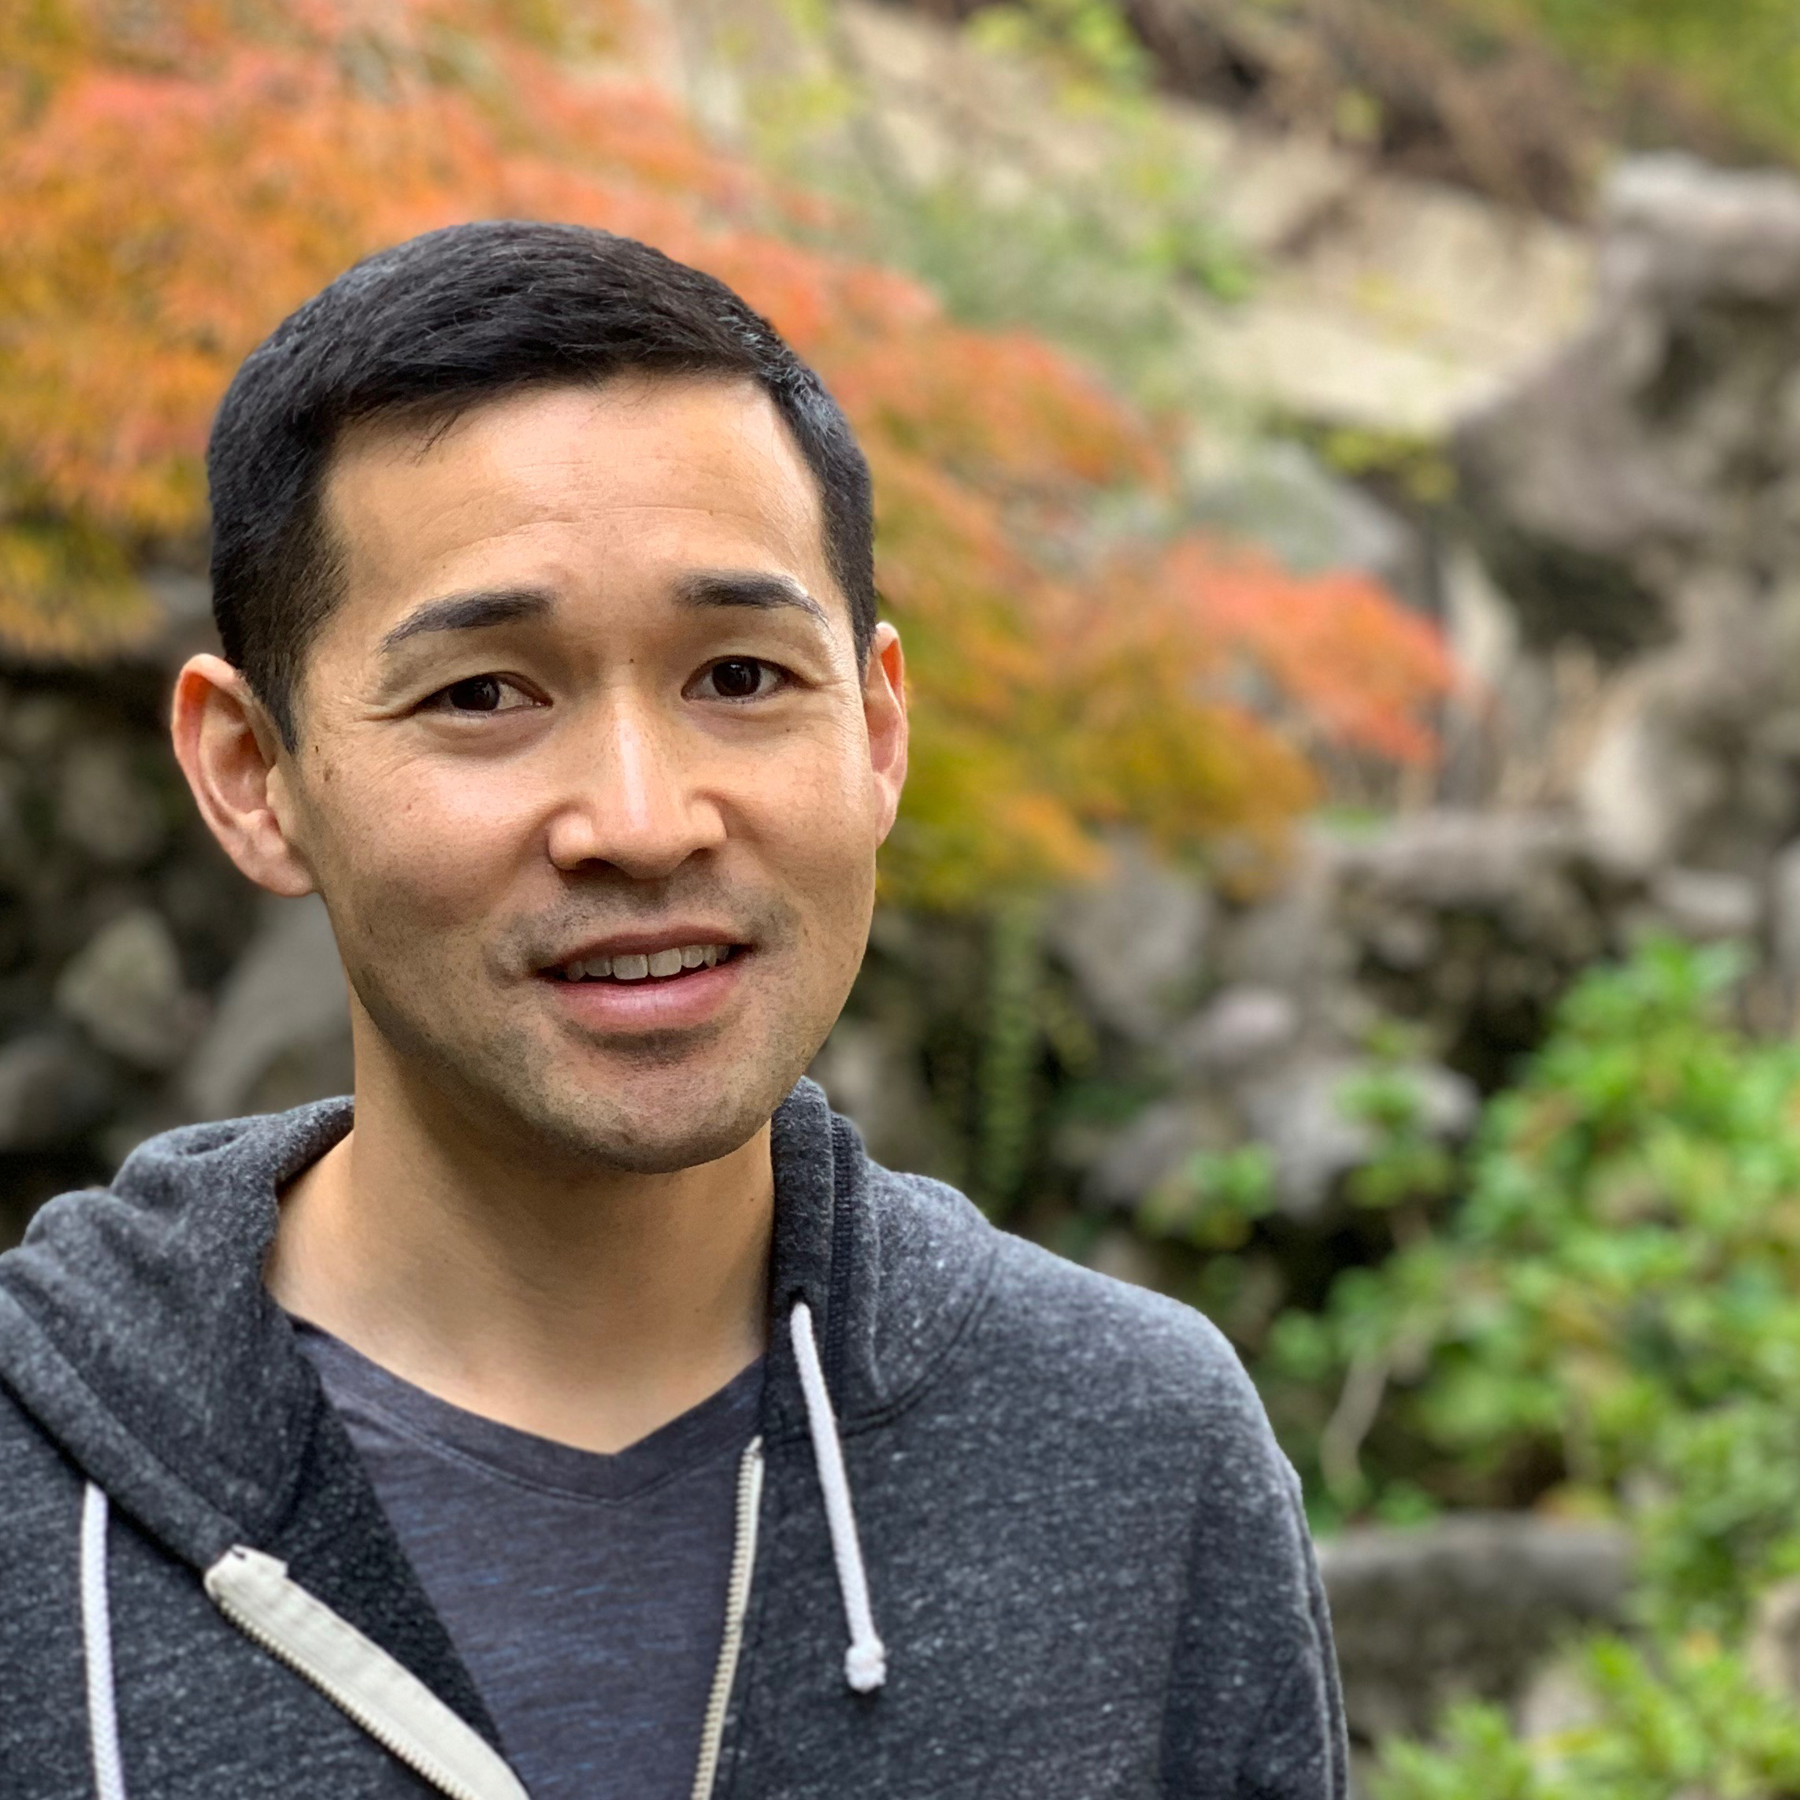 Photograph of Bradley Menda.